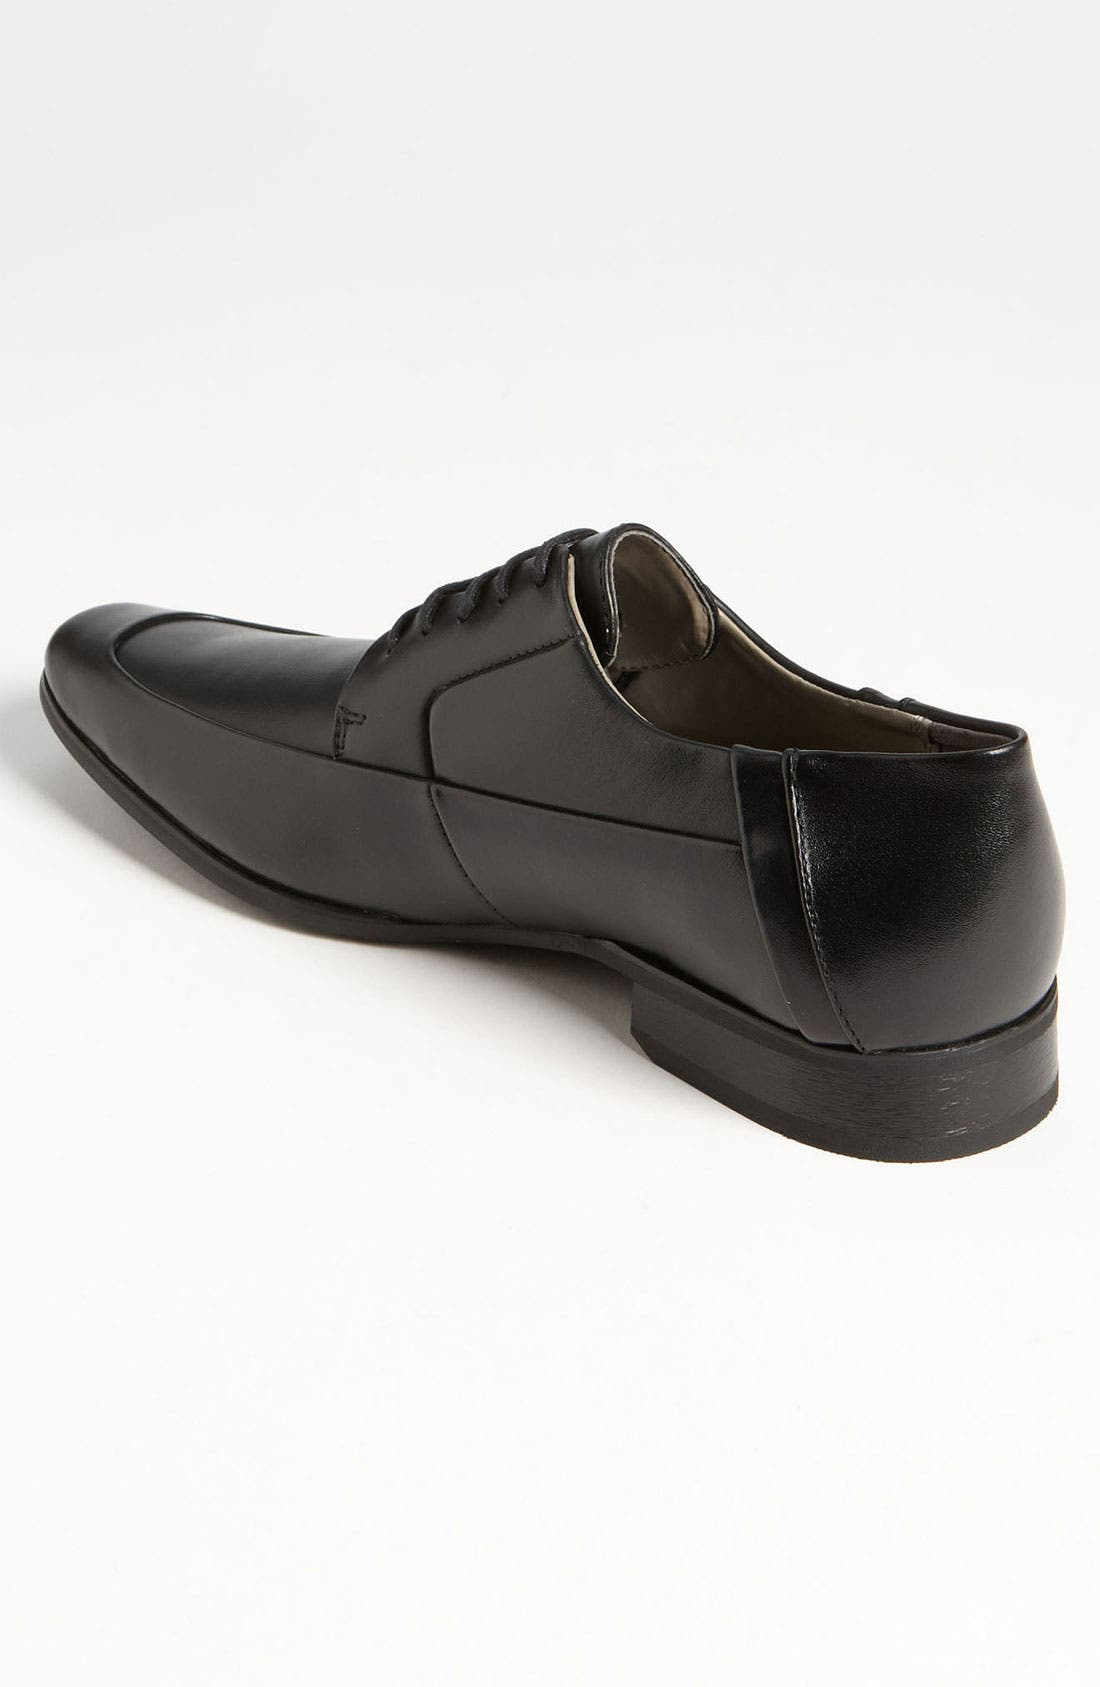 Alternate Image 2  - Calvin Klein 'Brent' Apron Toe Derby